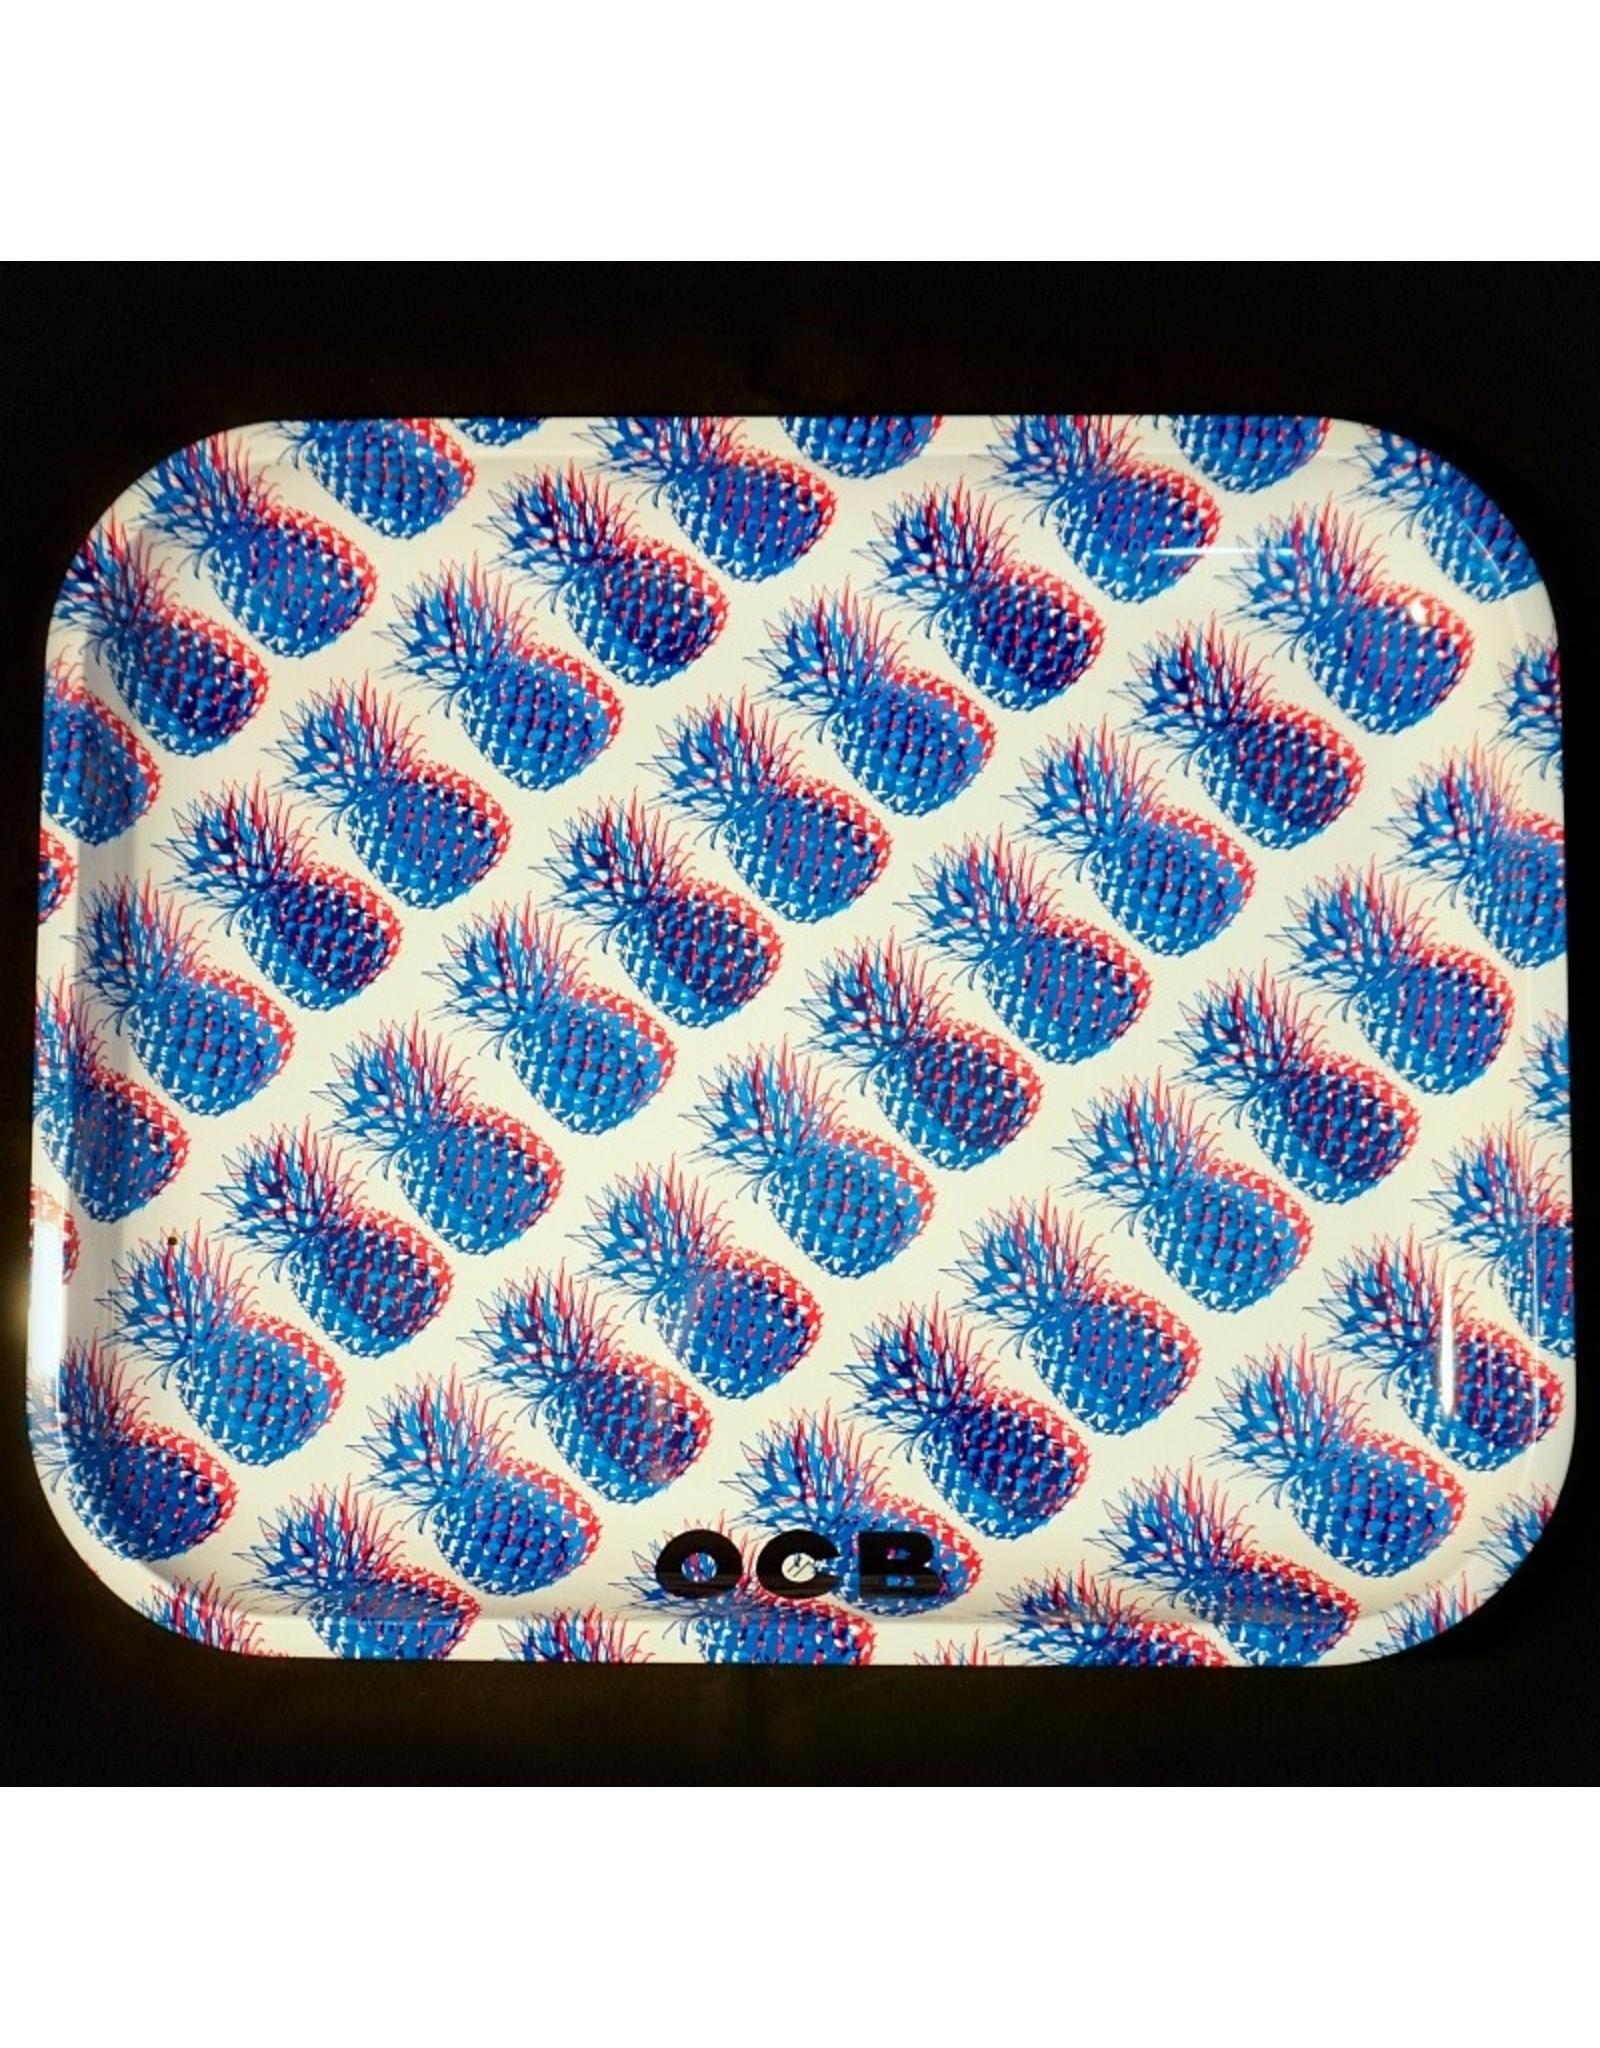 OCB OCB Pineapple Rolling Tray - Large